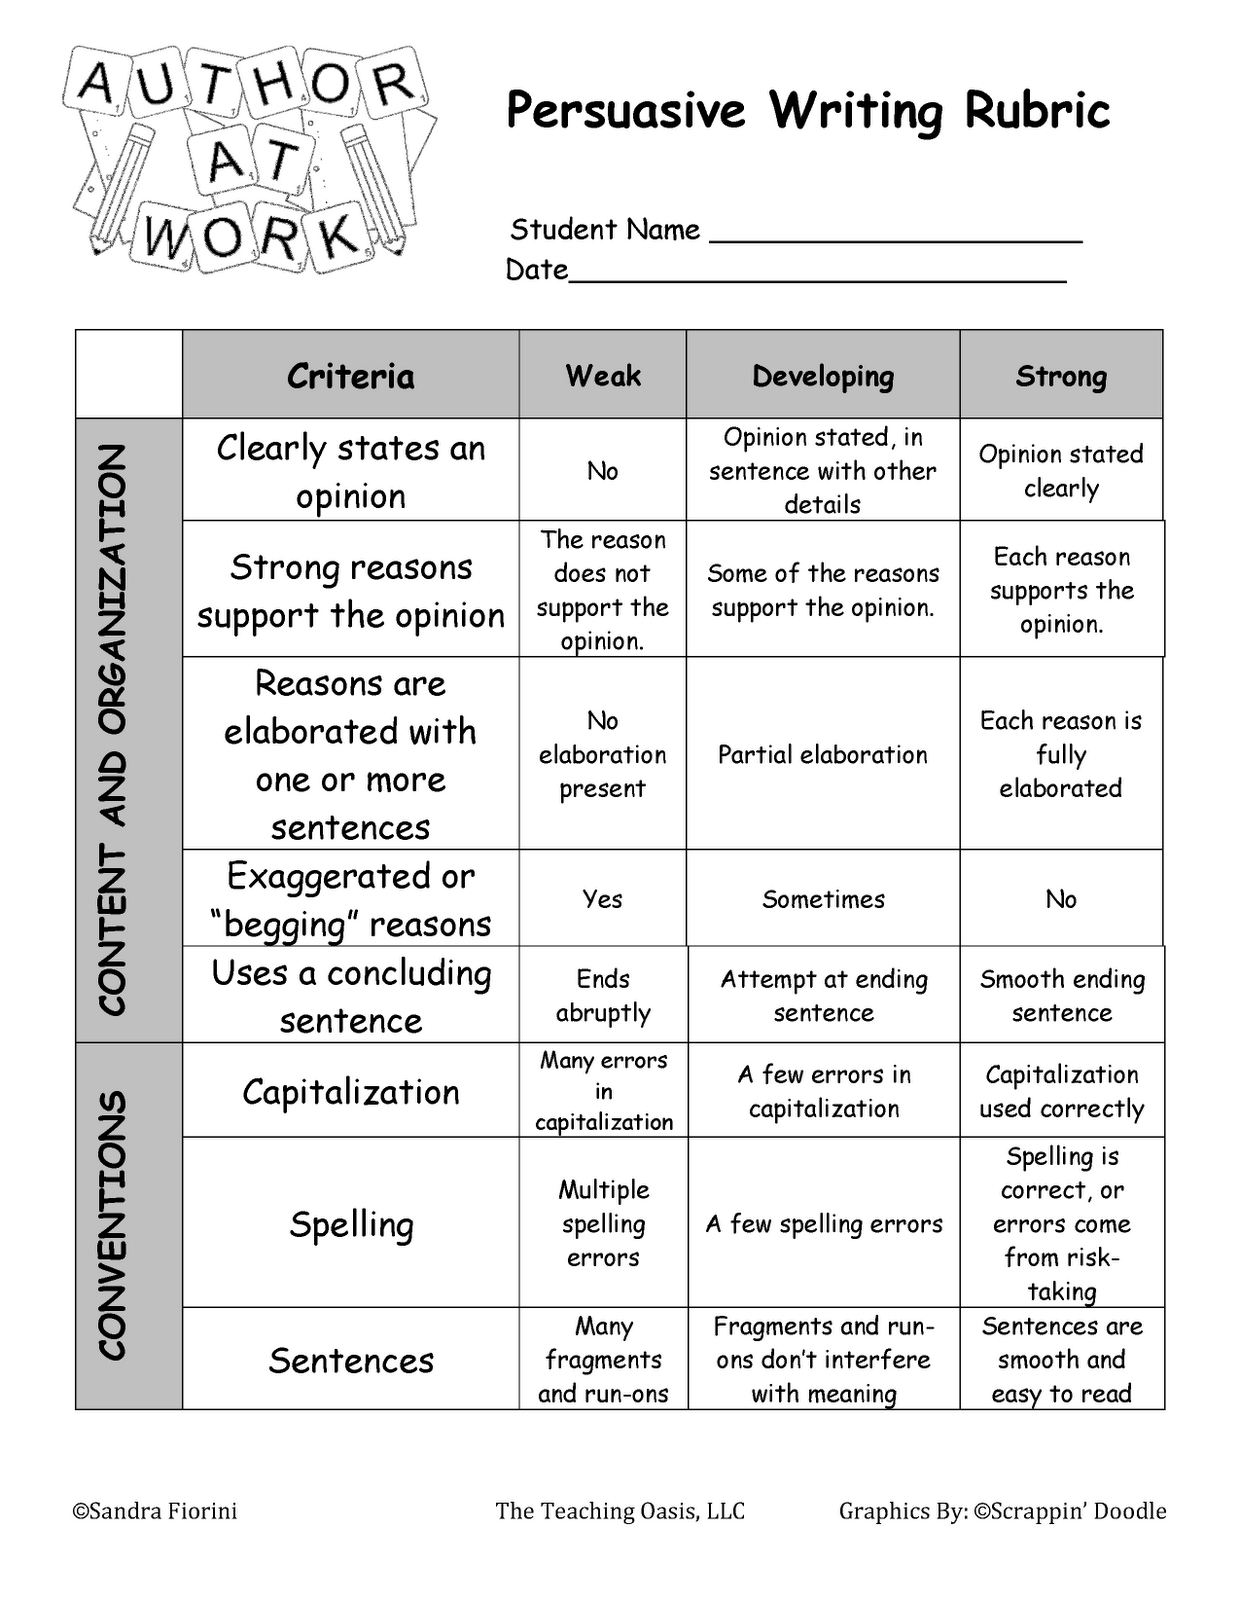 003 Essay Example Persuasive Rubric Stunning Argumentative Grade 10 8th Doc Middle School Pdf Full